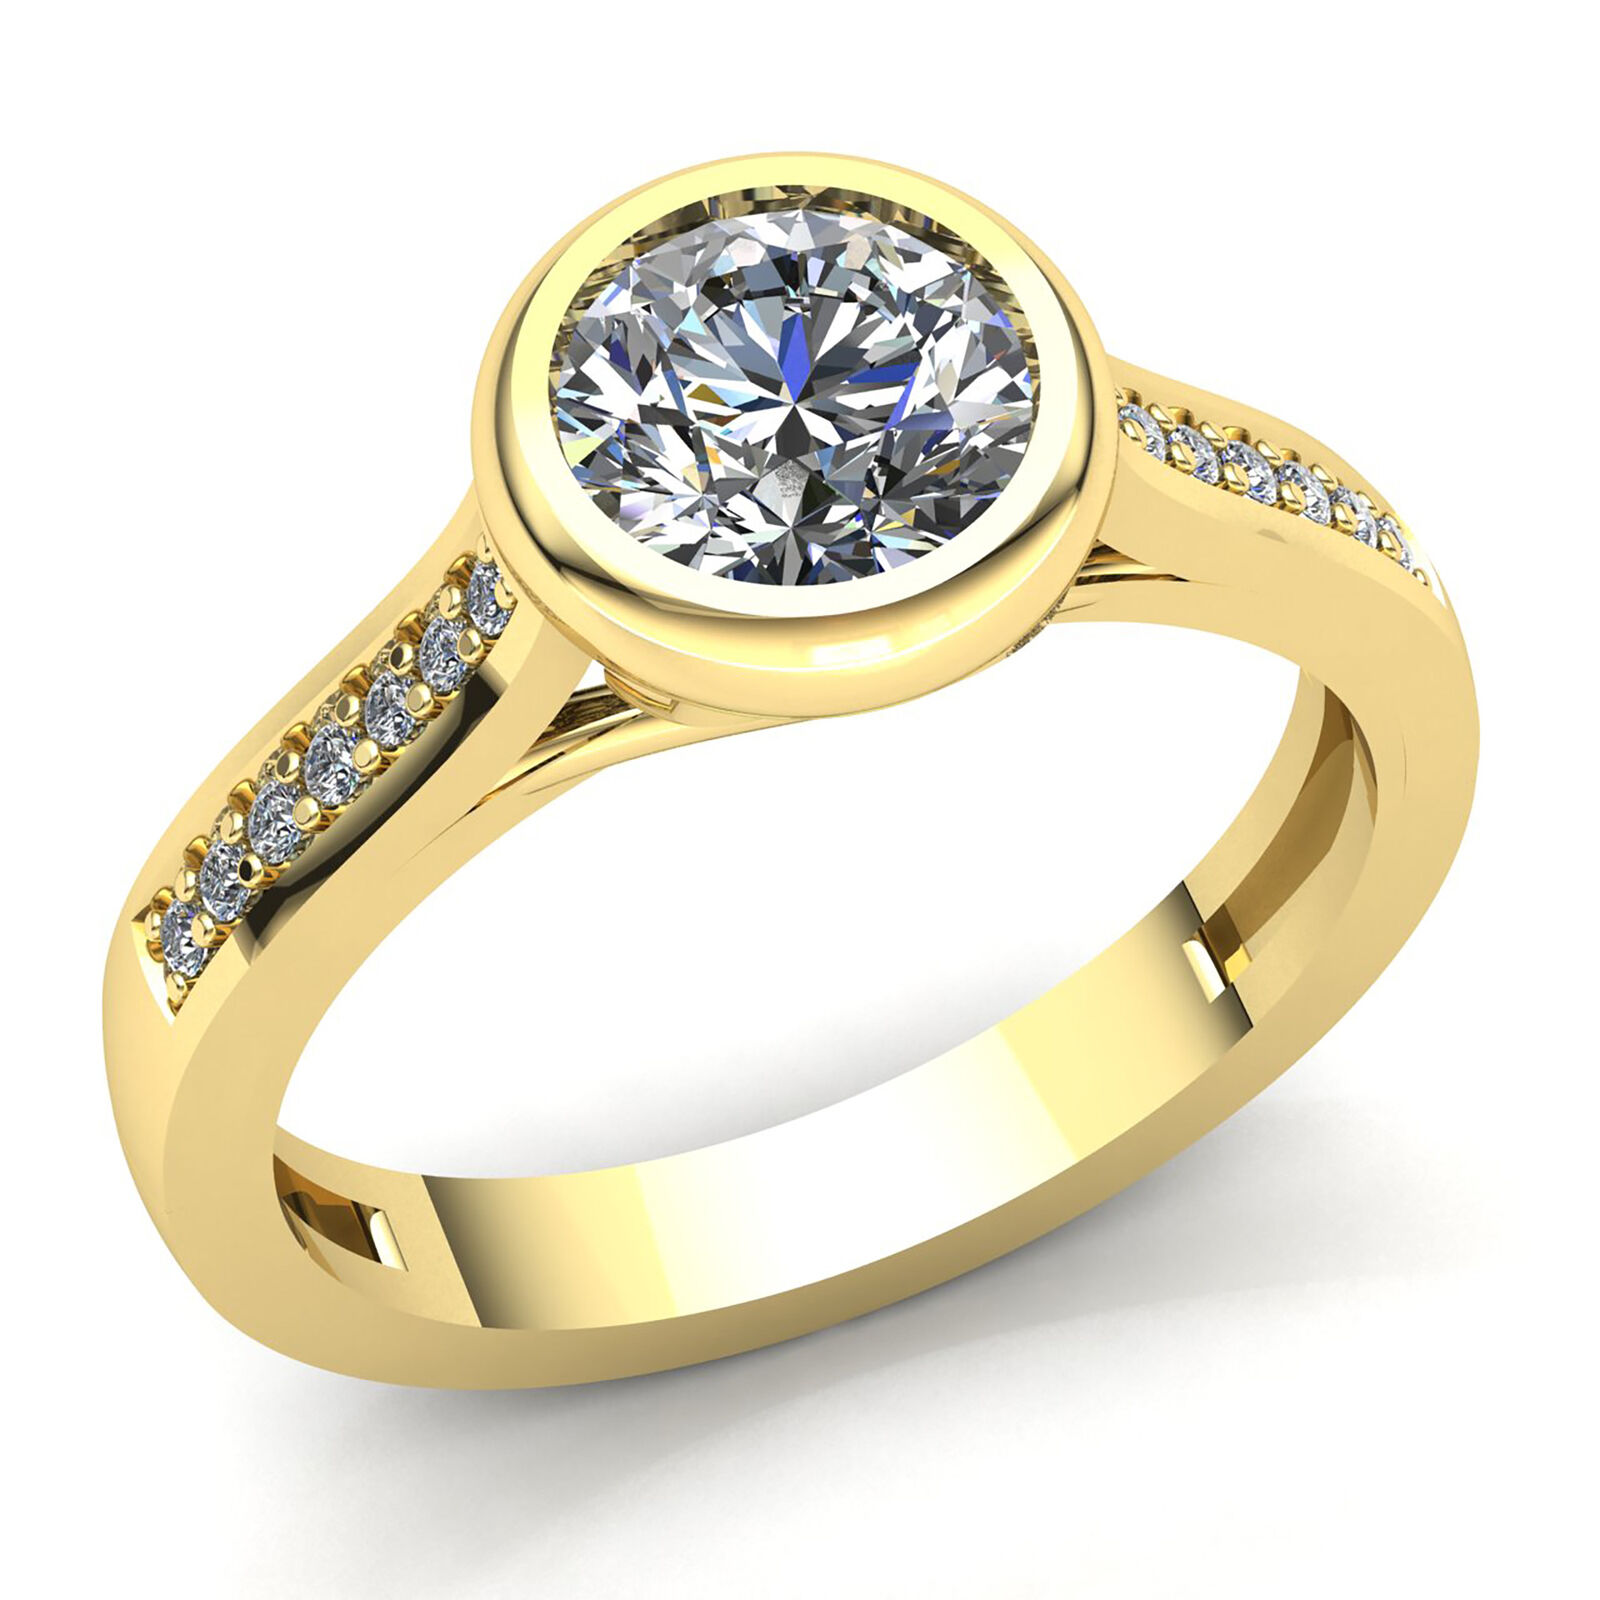 Natural 0.33carat Round Diamond Ladies Bridal Solitaire Engagement Ring 10K gold